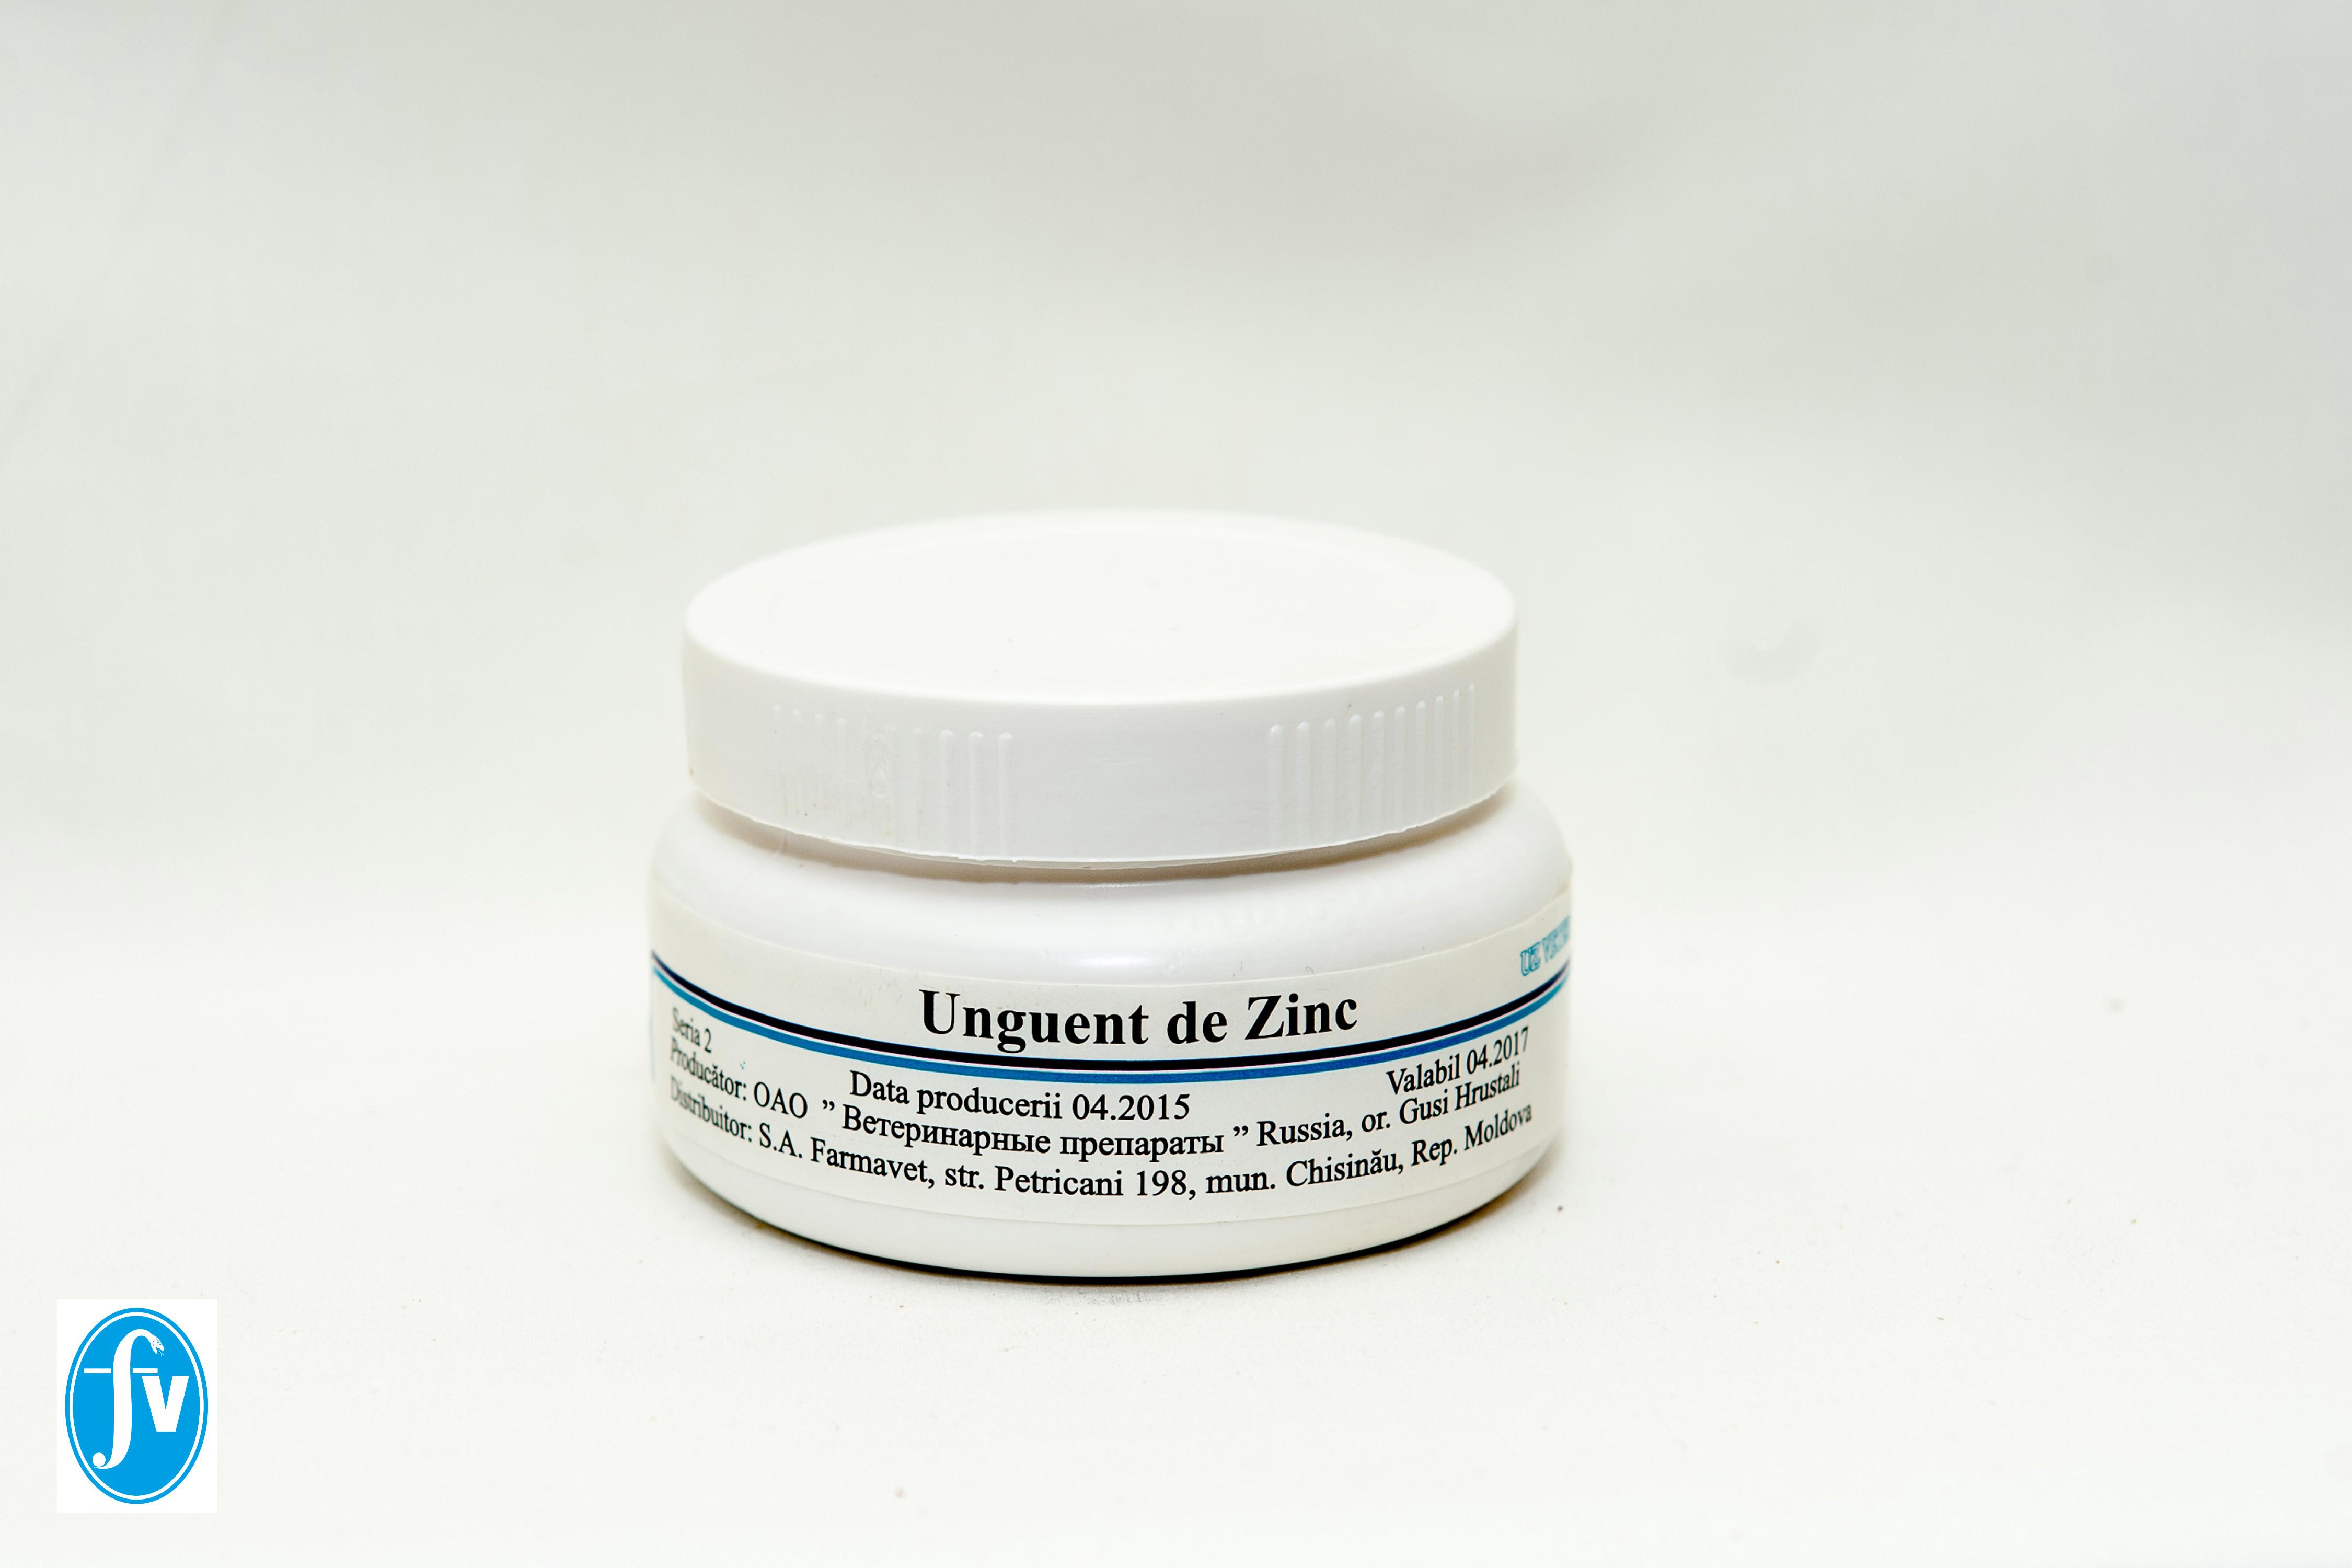 rosturi de unguent de zinc